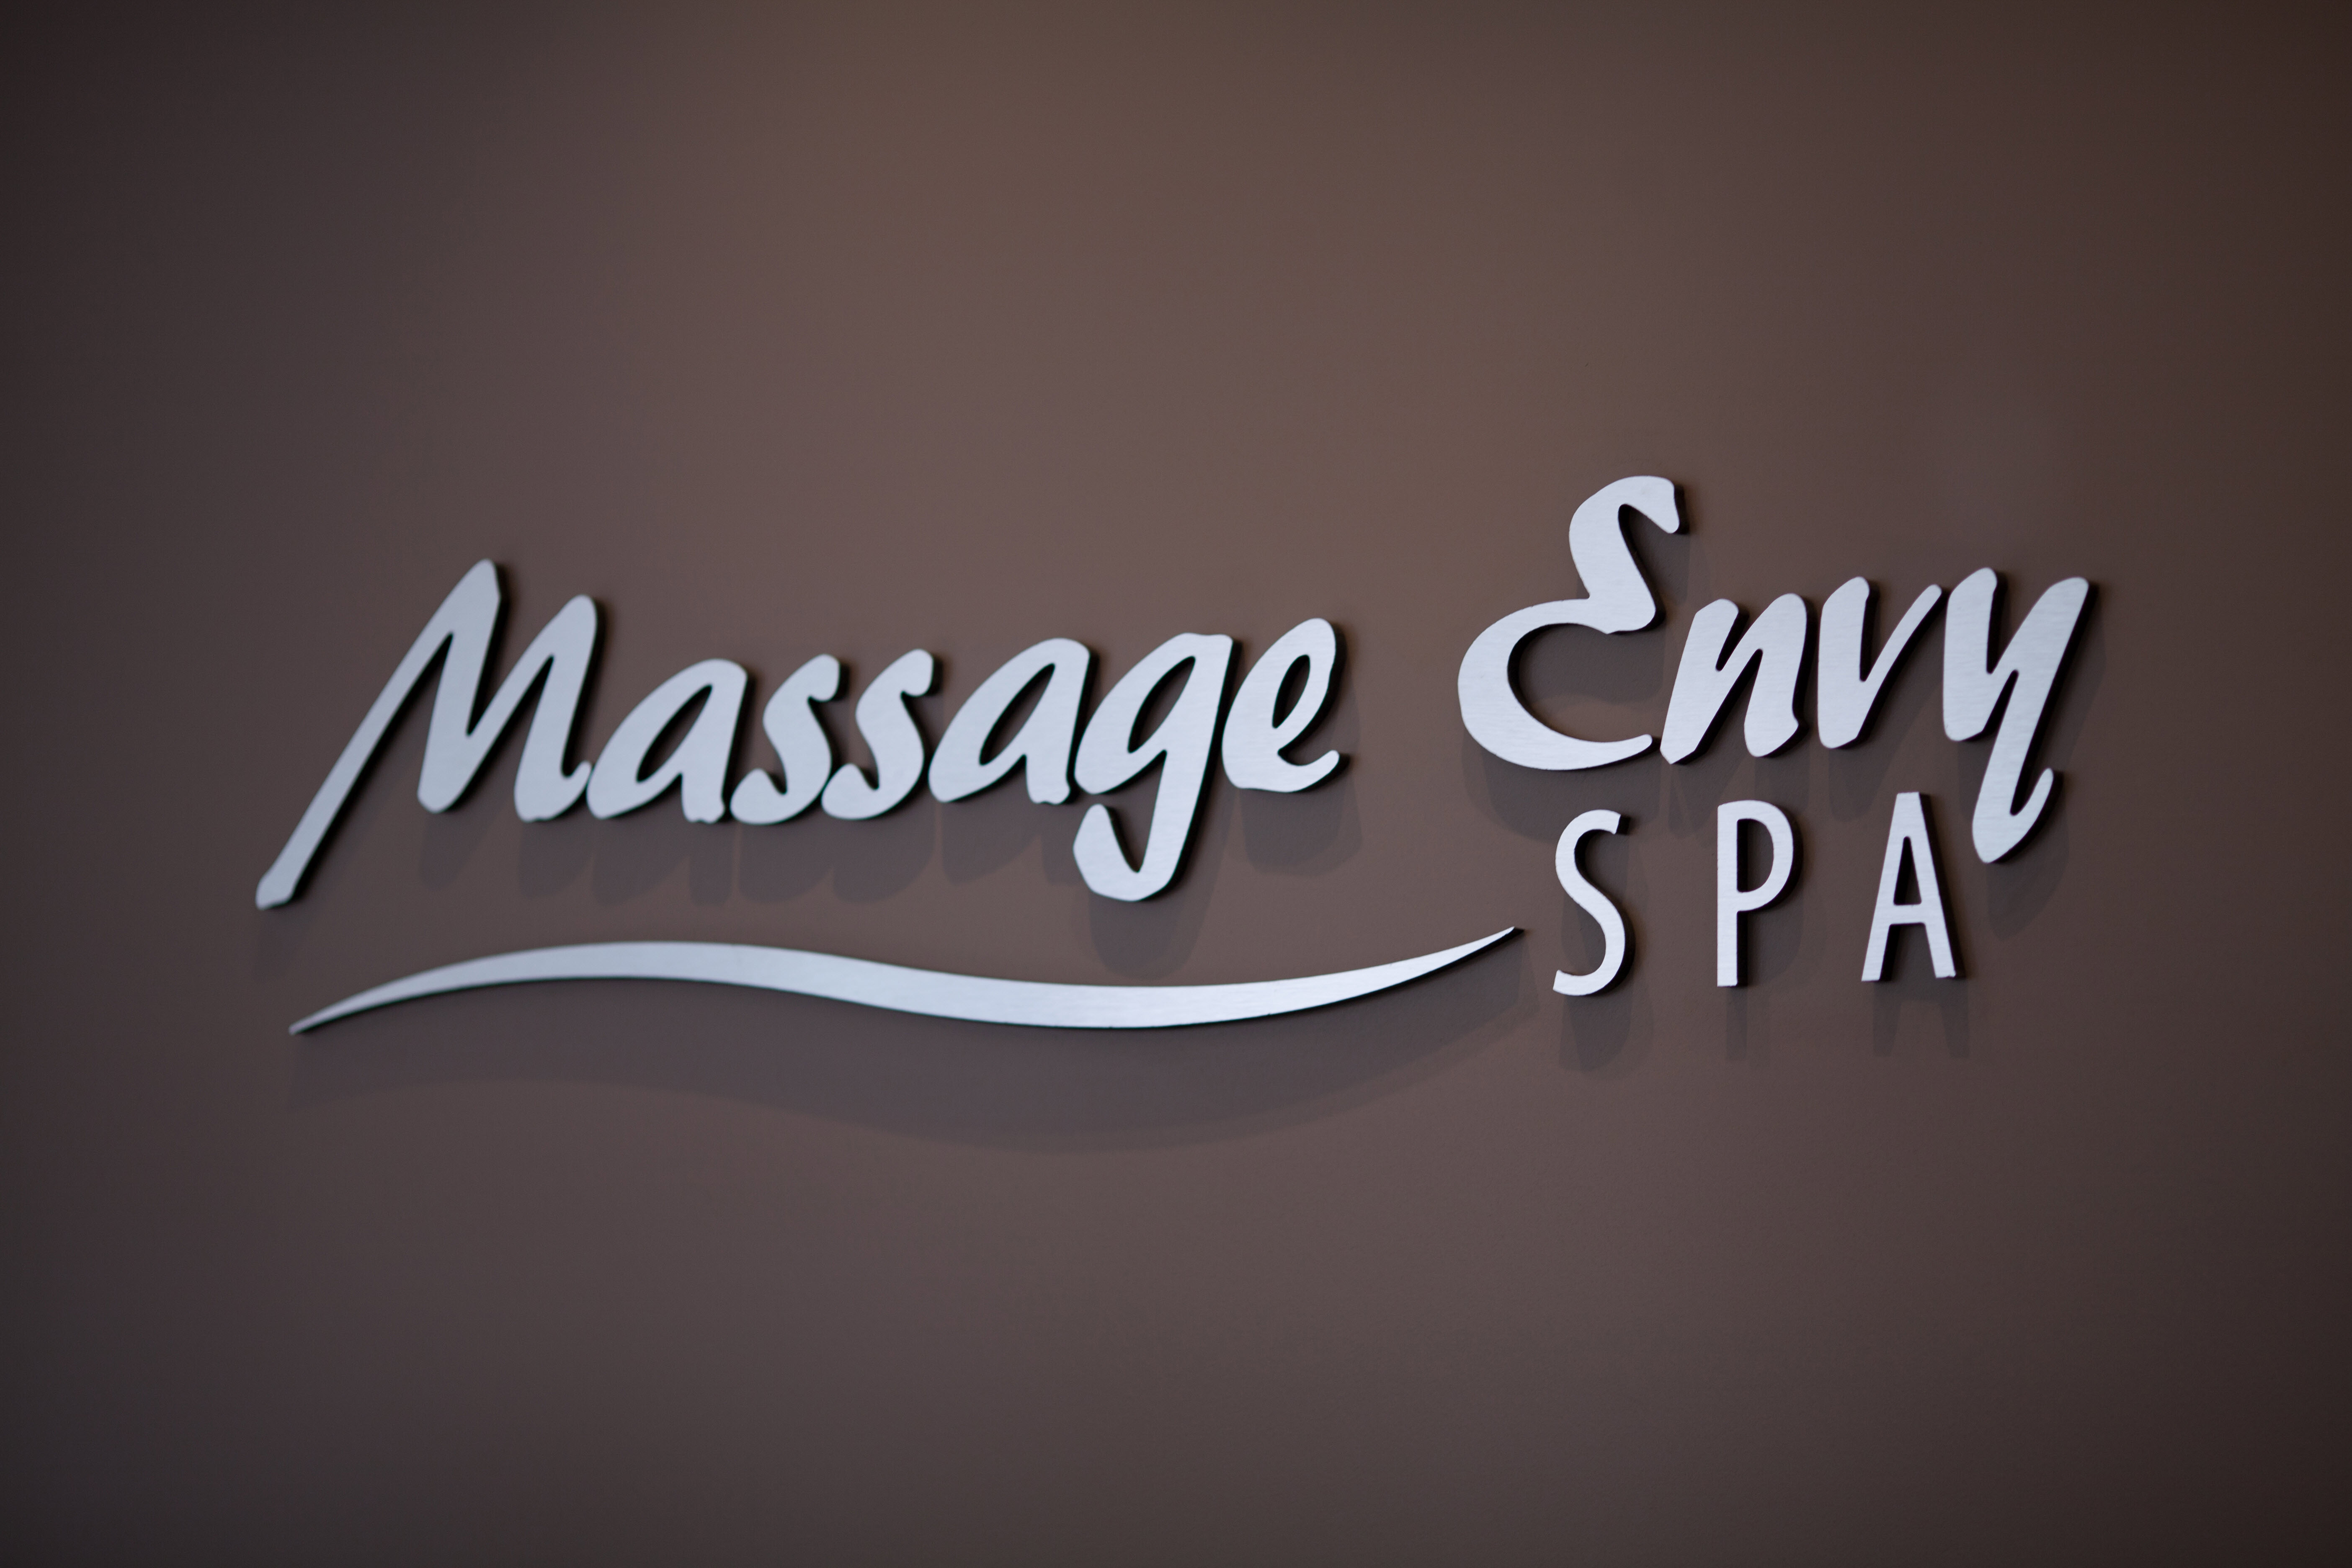 Massage Envy Spa - Merrick